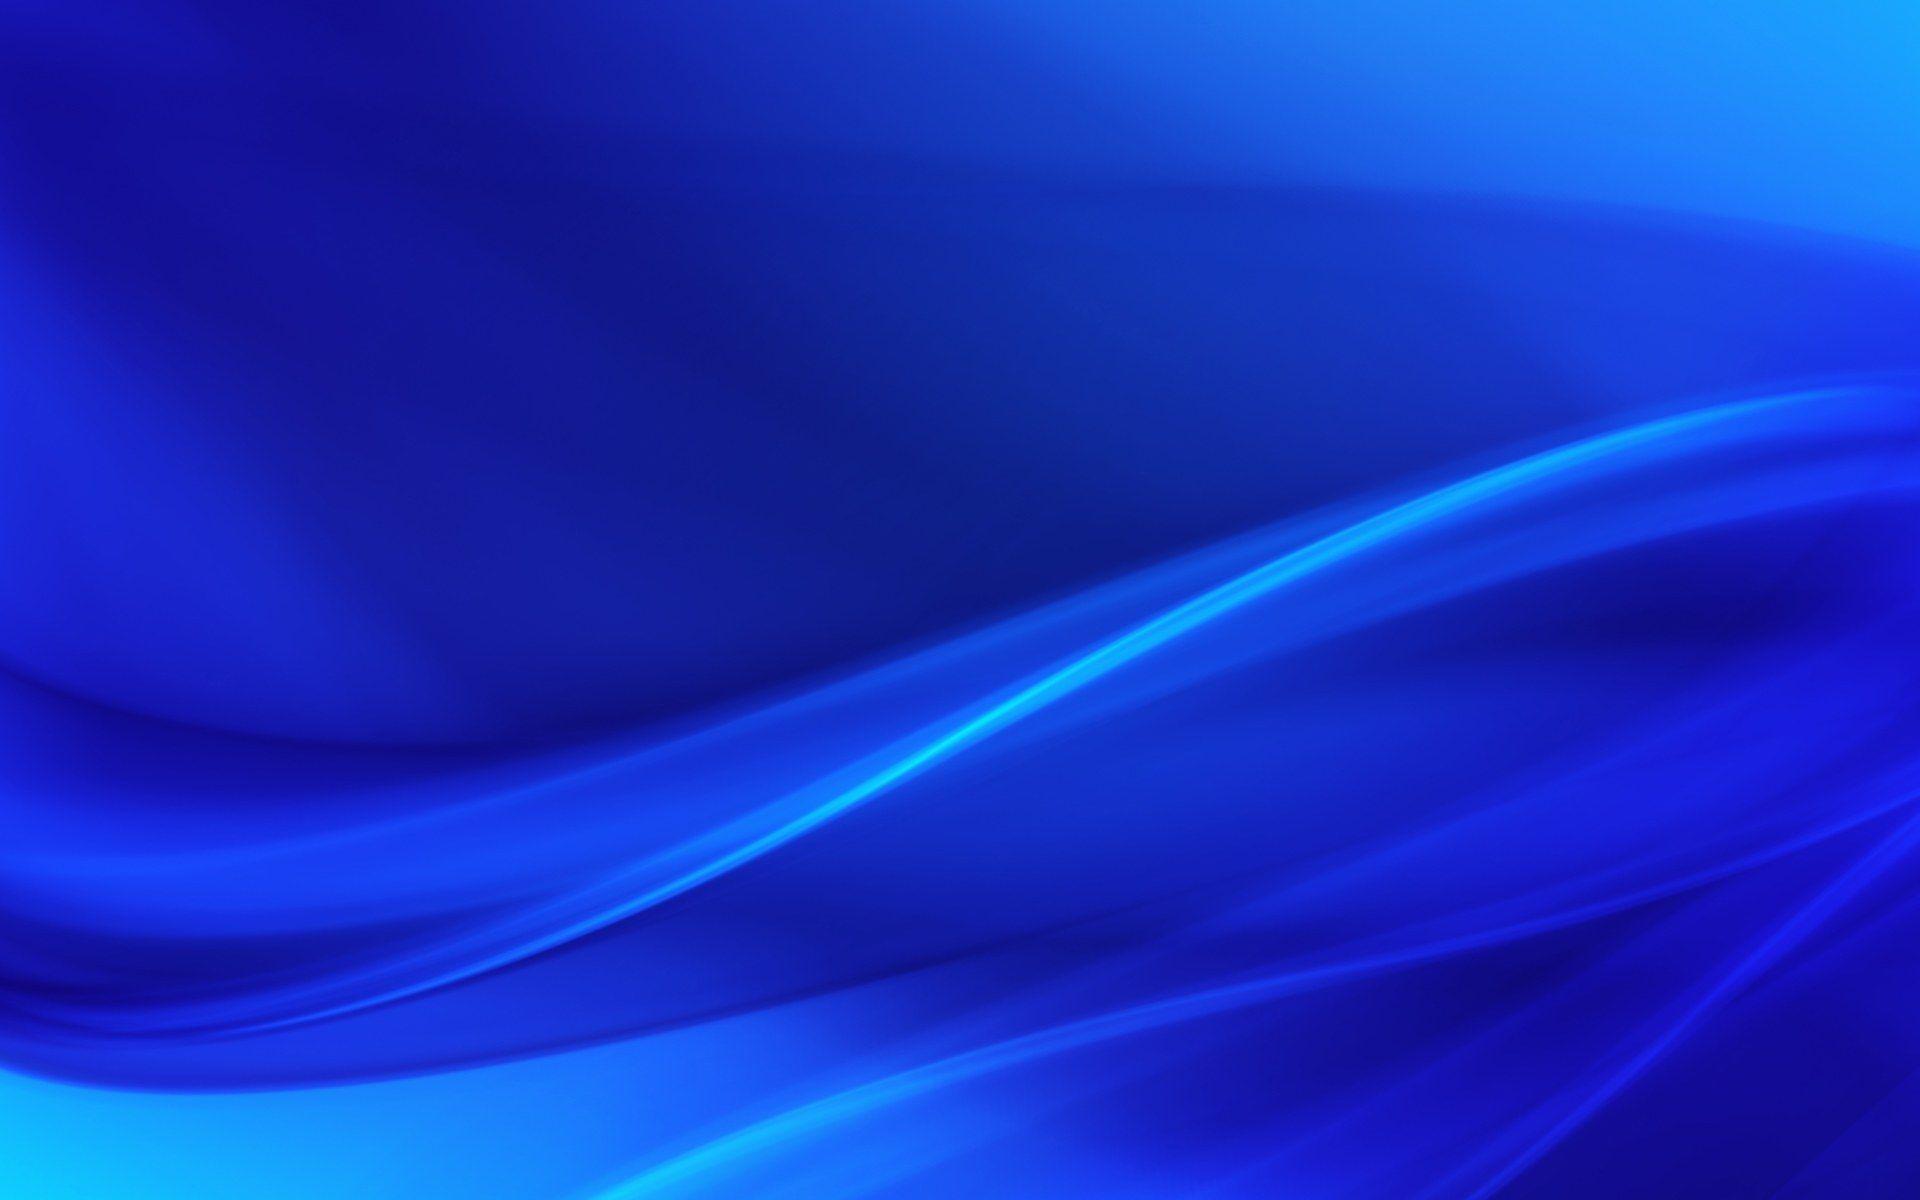 Blue Background Desktop Wallpaper Blue Background Wallpapers